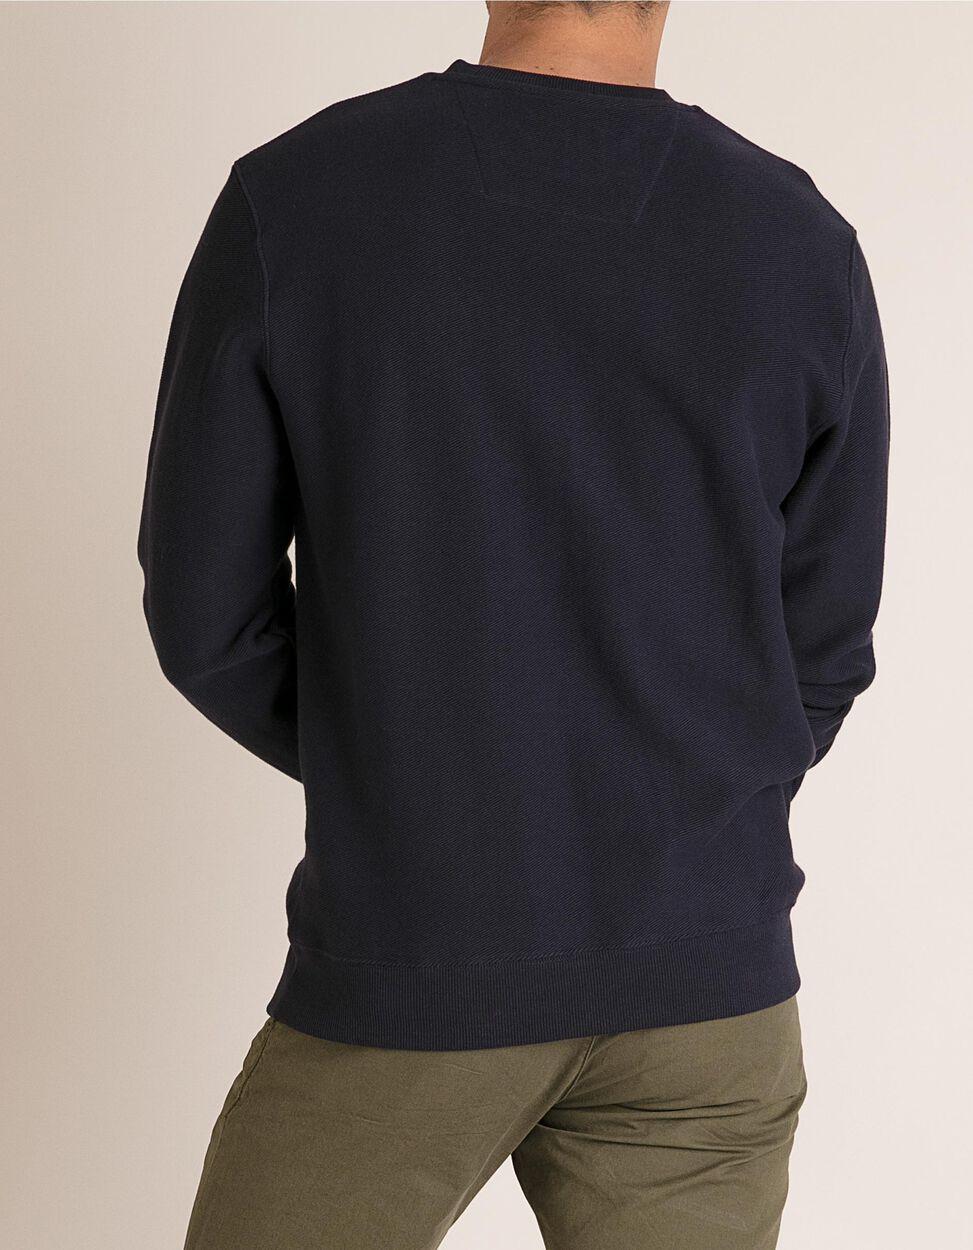 Sweatshirt Algodão